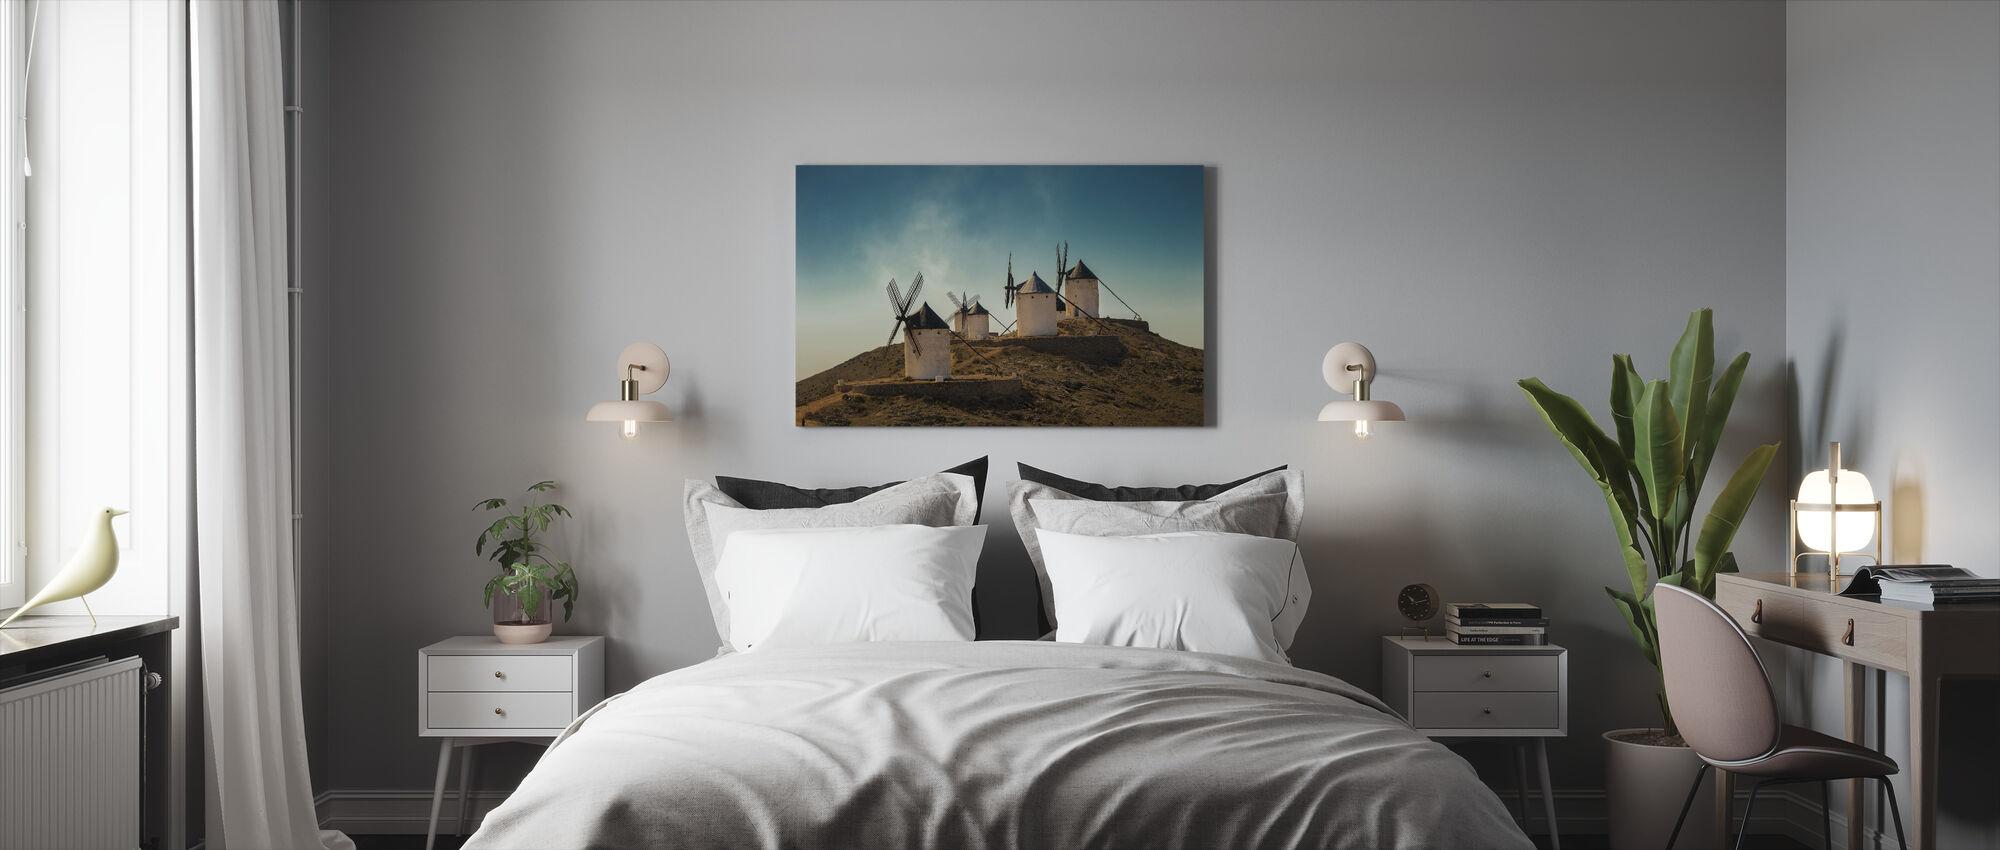 Com-in-law - Canvas print - Bedroom